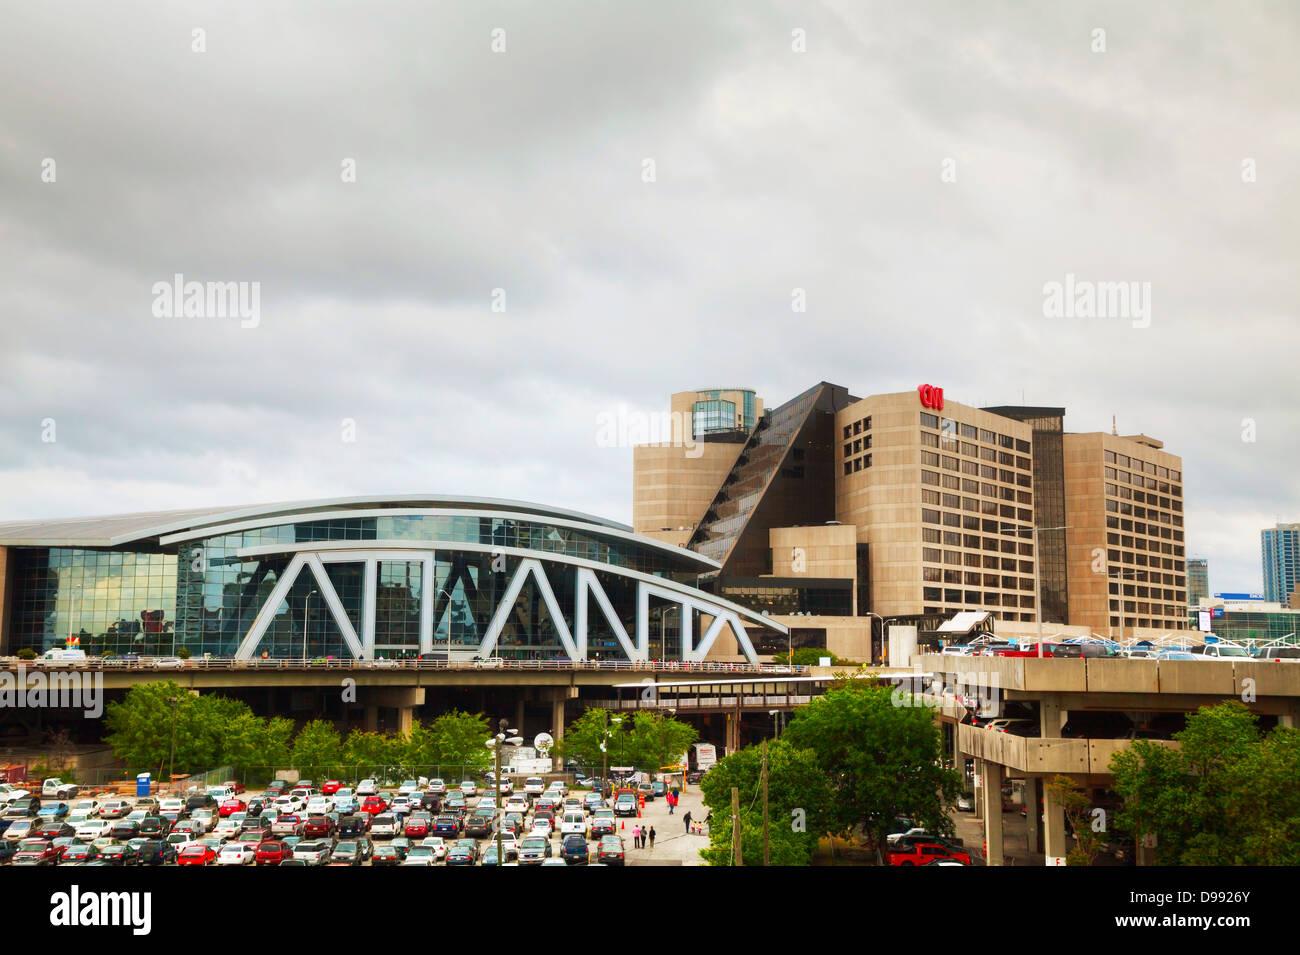 Philips Arena Stock Photos & Philips Arena Stock Images - Alamy